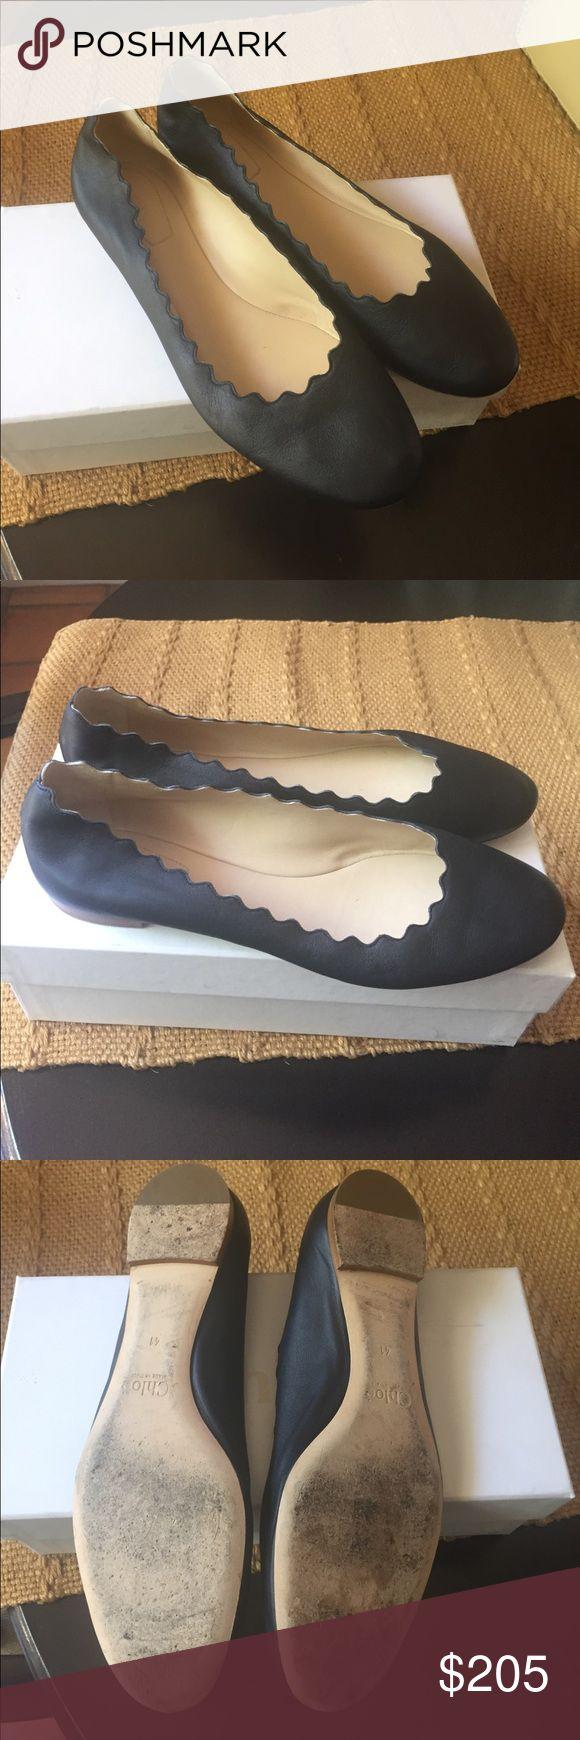 Chloe navy ballet flat Really pretty deep navy scalloped ballet flat Chloe Shoes Flats & Loafers